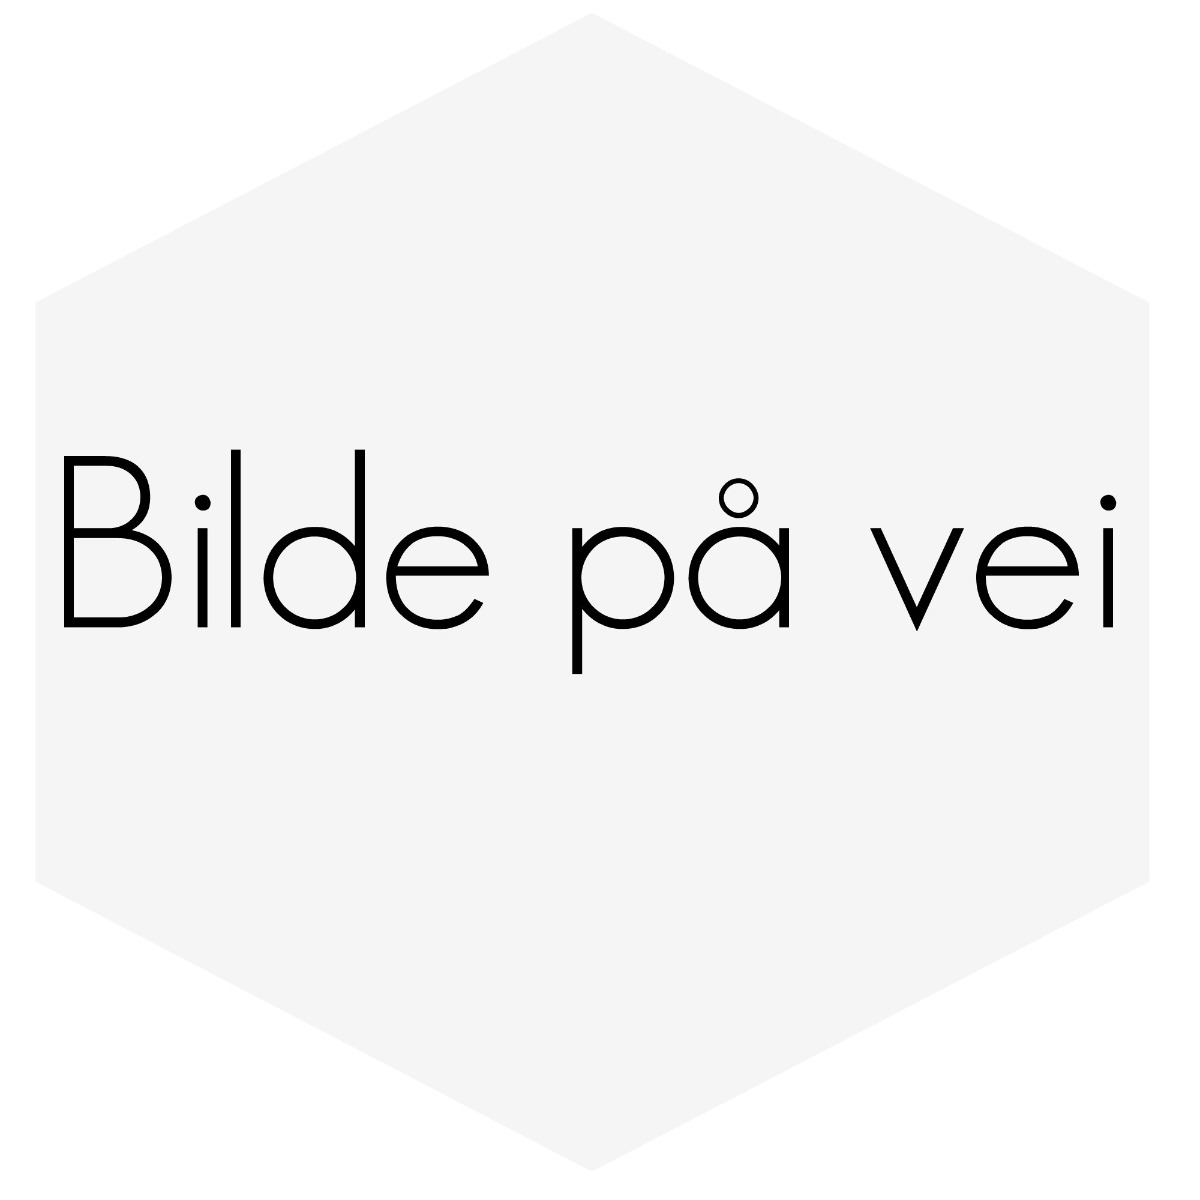 SKVETTLAPPER FORAN TIL VOLVO XC90 03-14